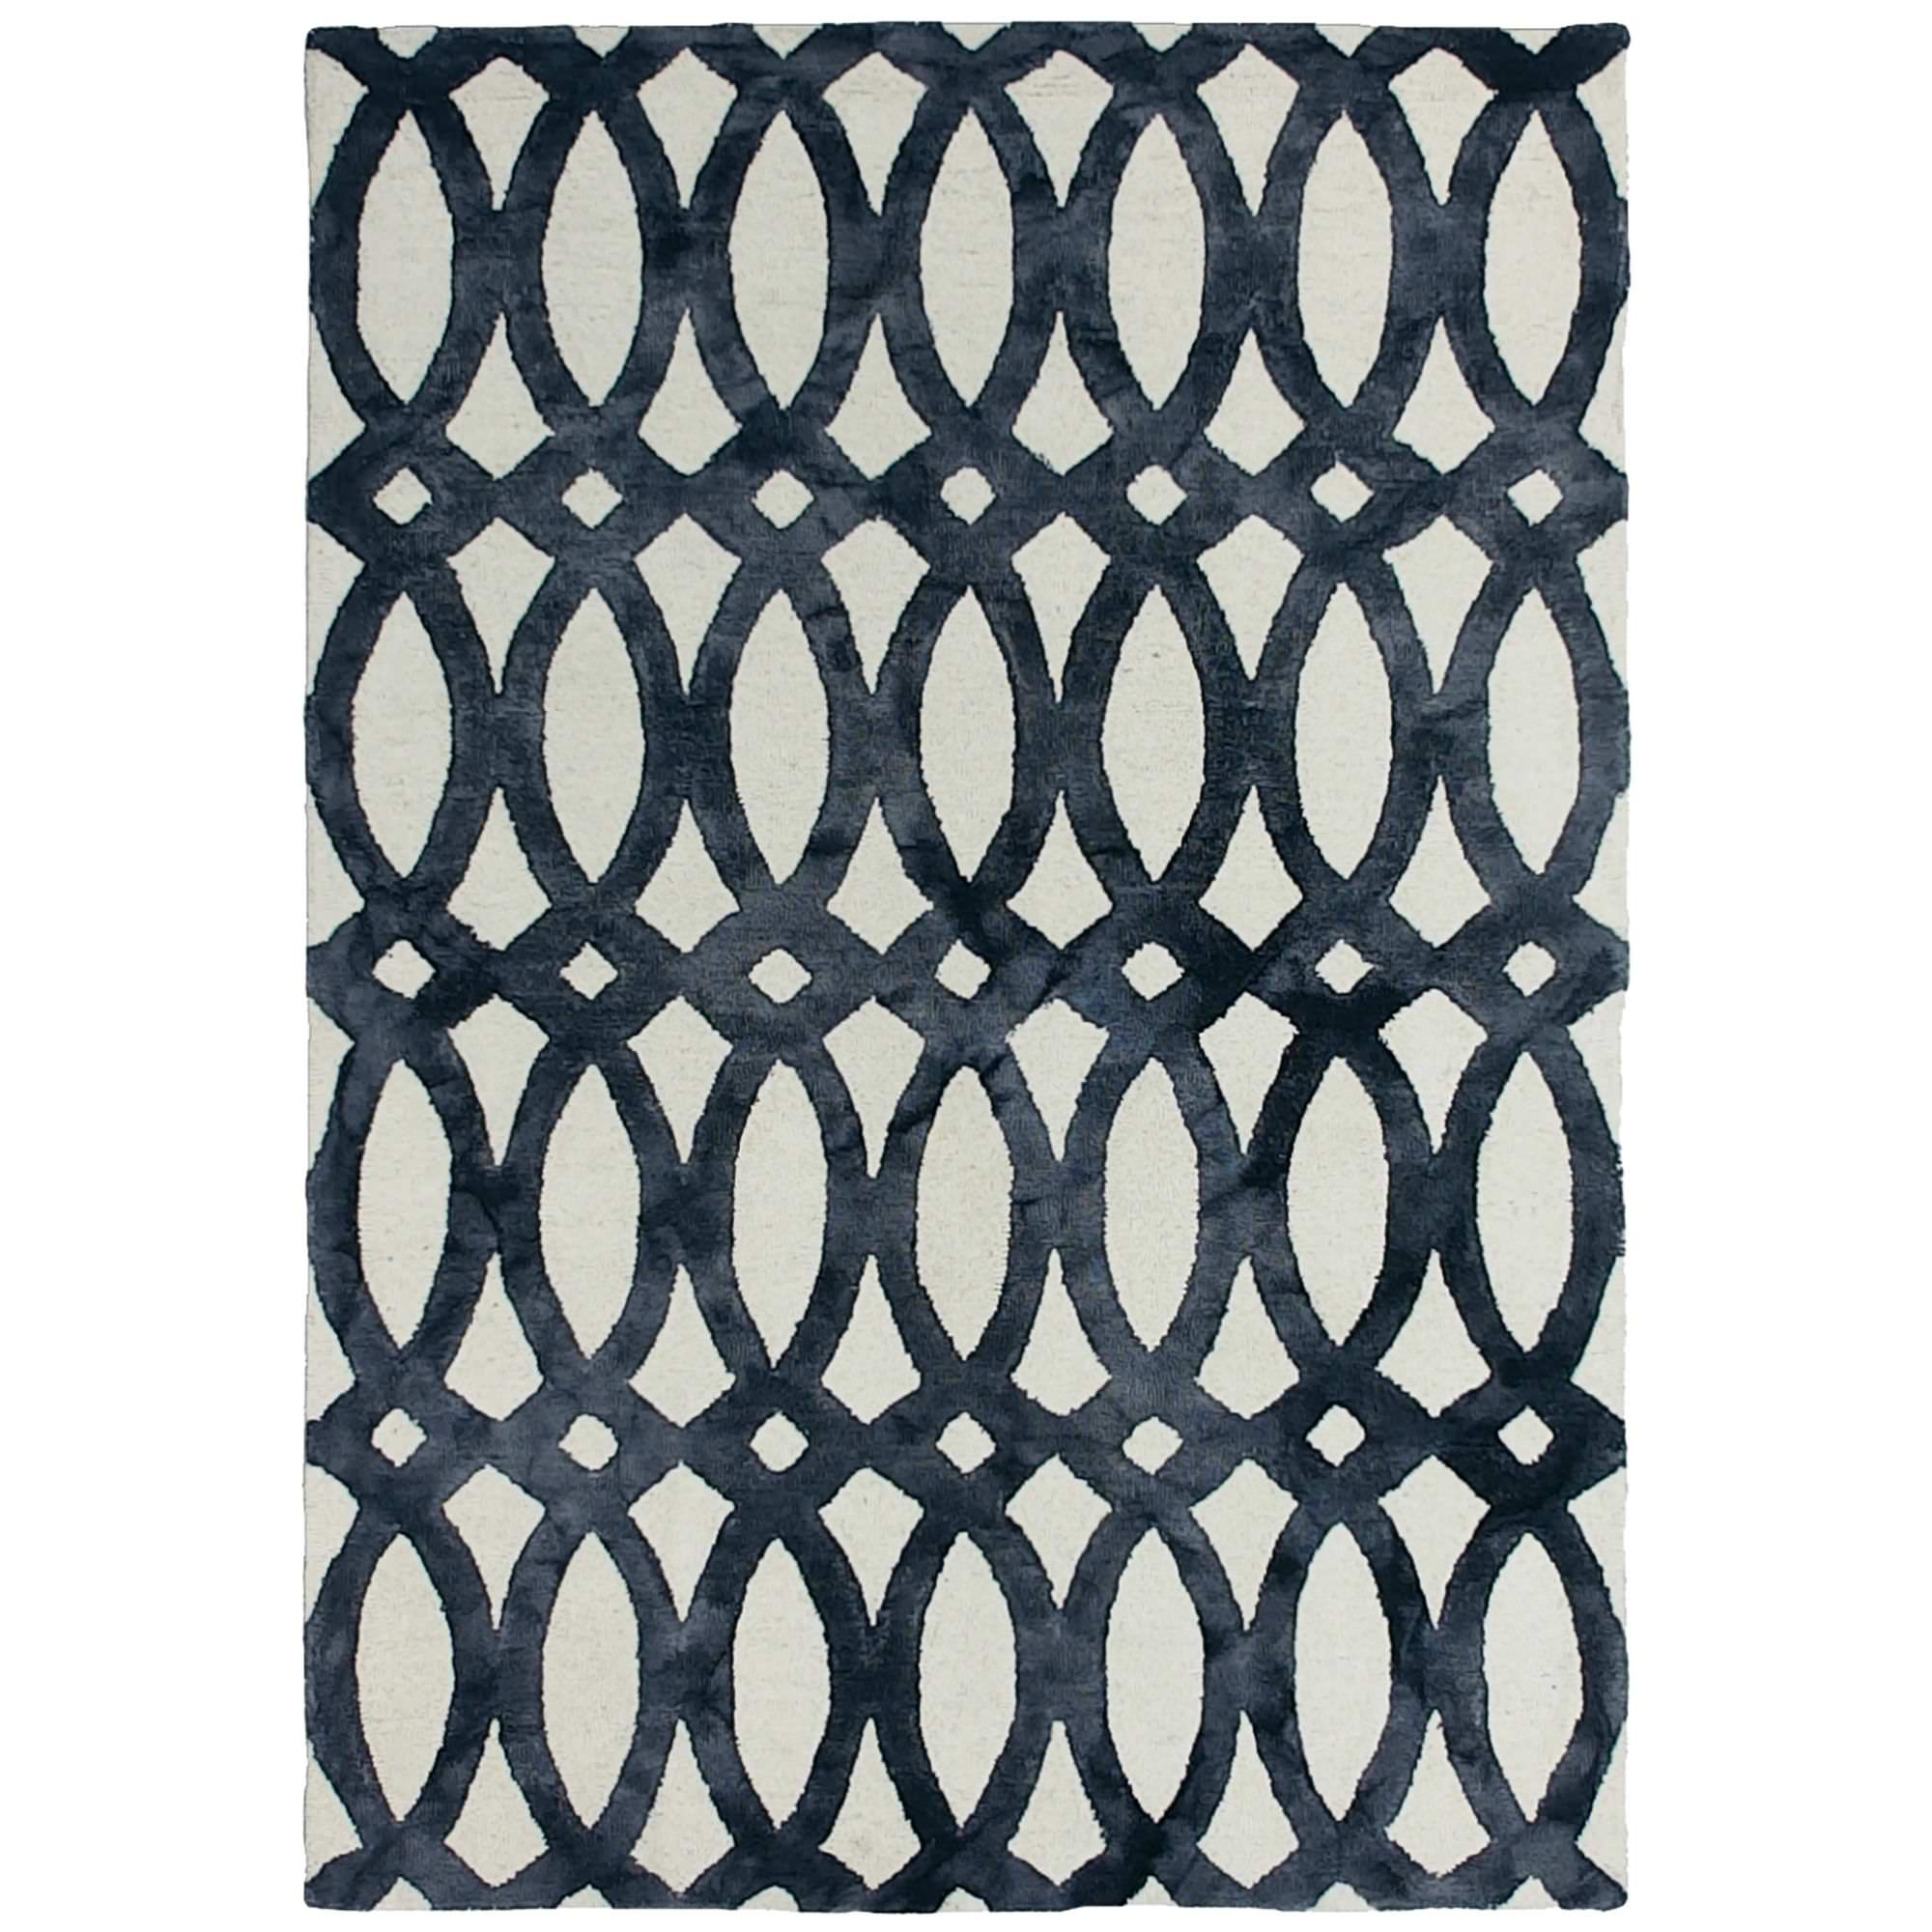 Dip Dye Hand Tufted Wool Rug, 300x400cm, Charcoal